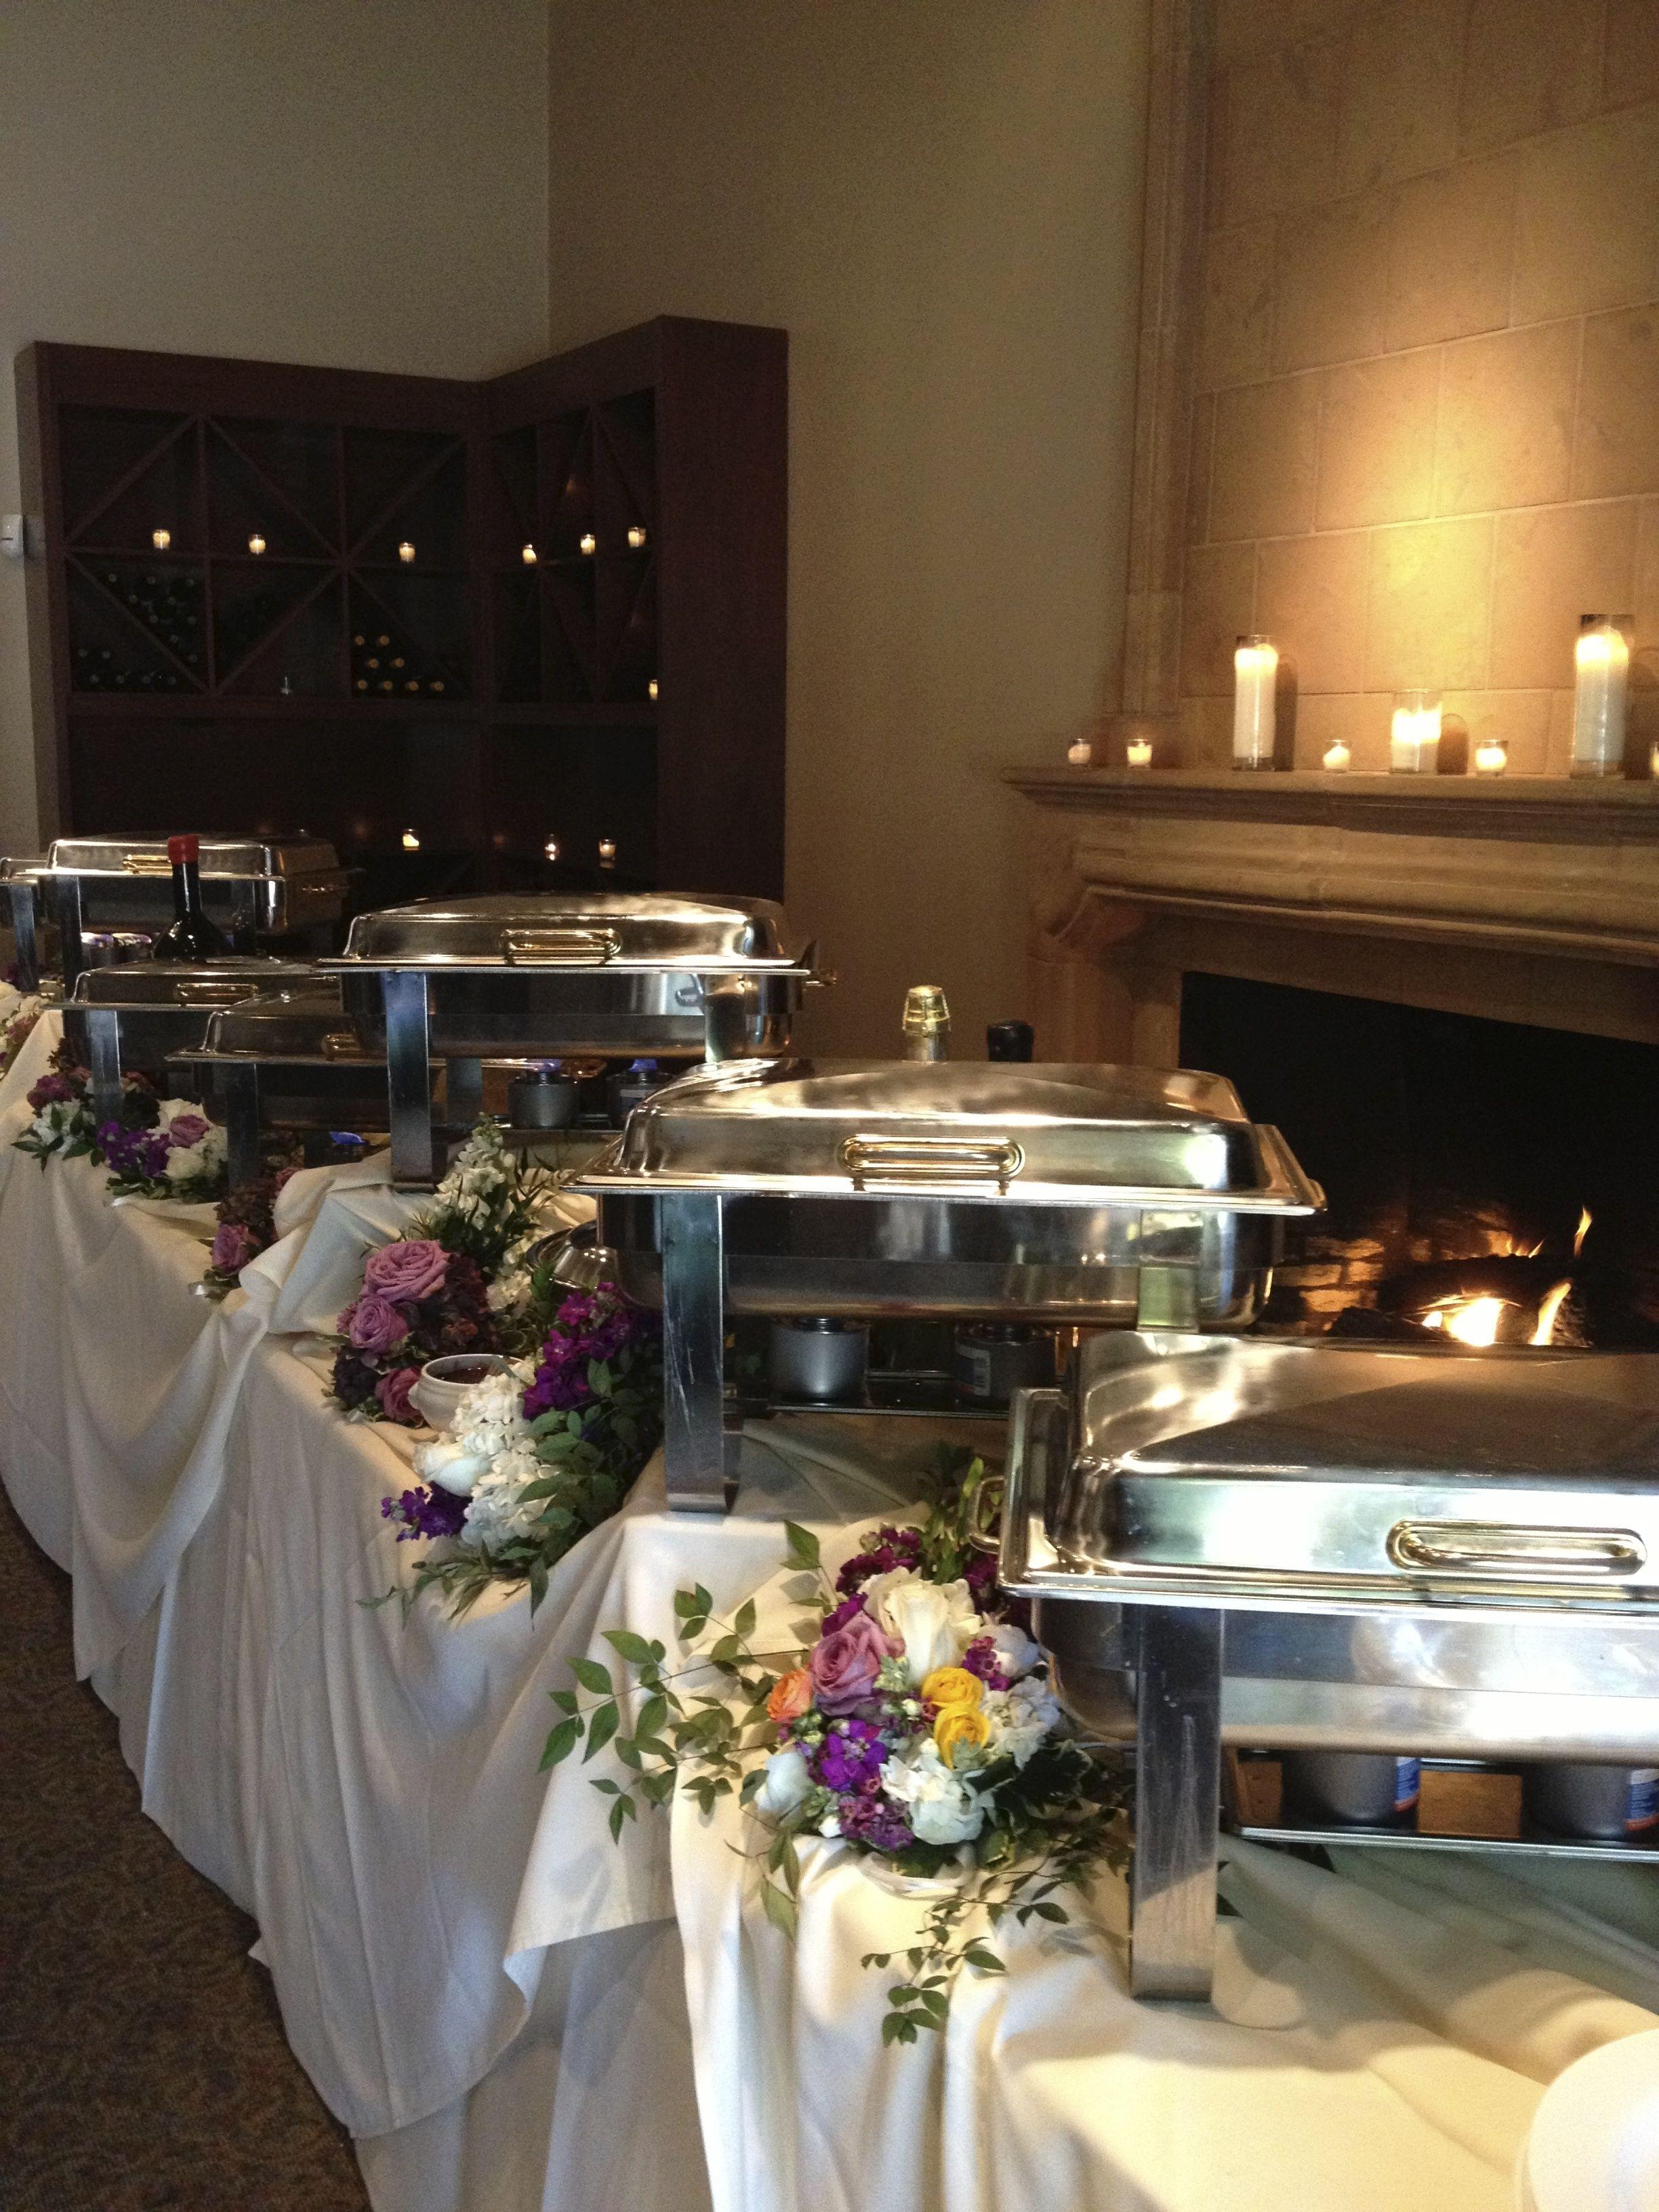 Catering Companies In Utah Why Choosing Rockwell Catering